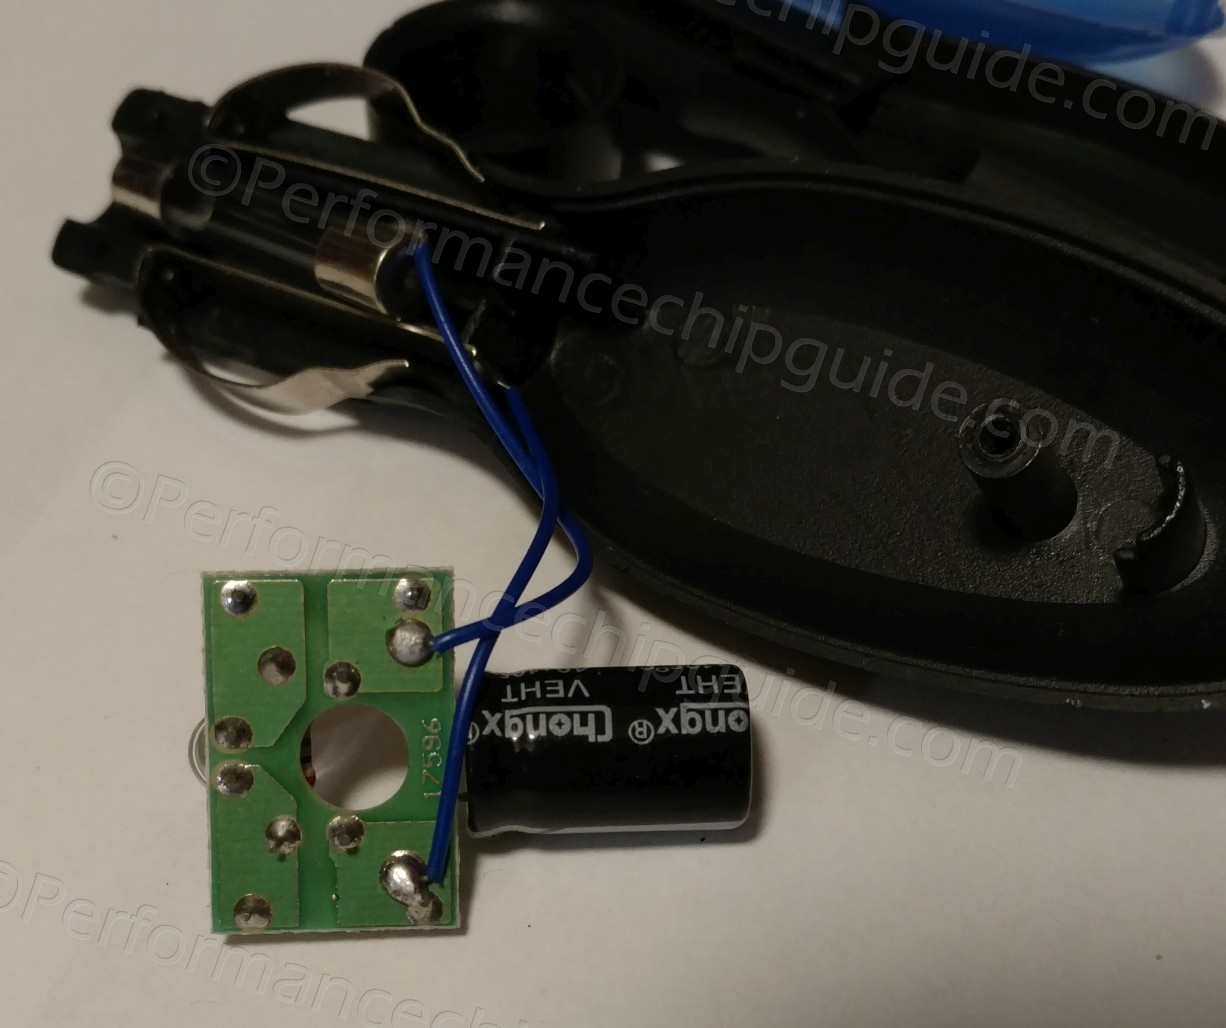 Neosocket Fuel Shark Circuit Board Reverse View Bottom Side